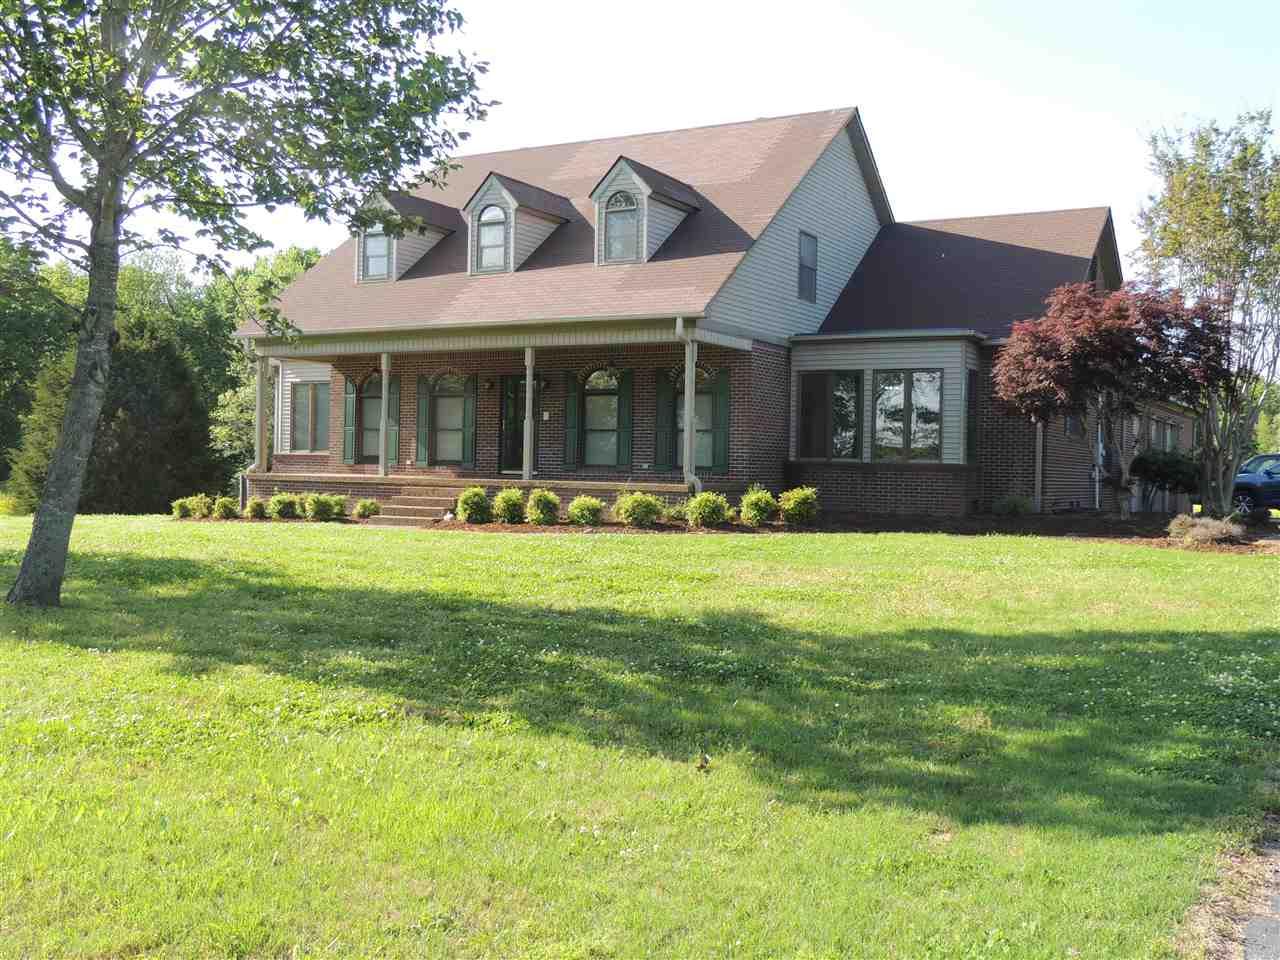 1450 Ditmore Rd,Newbern,Tennessee 38059,4 Bedrooms Bedrooms,3 BathroomsBathrooms,Residential,1450 Ditmore Rd,182722